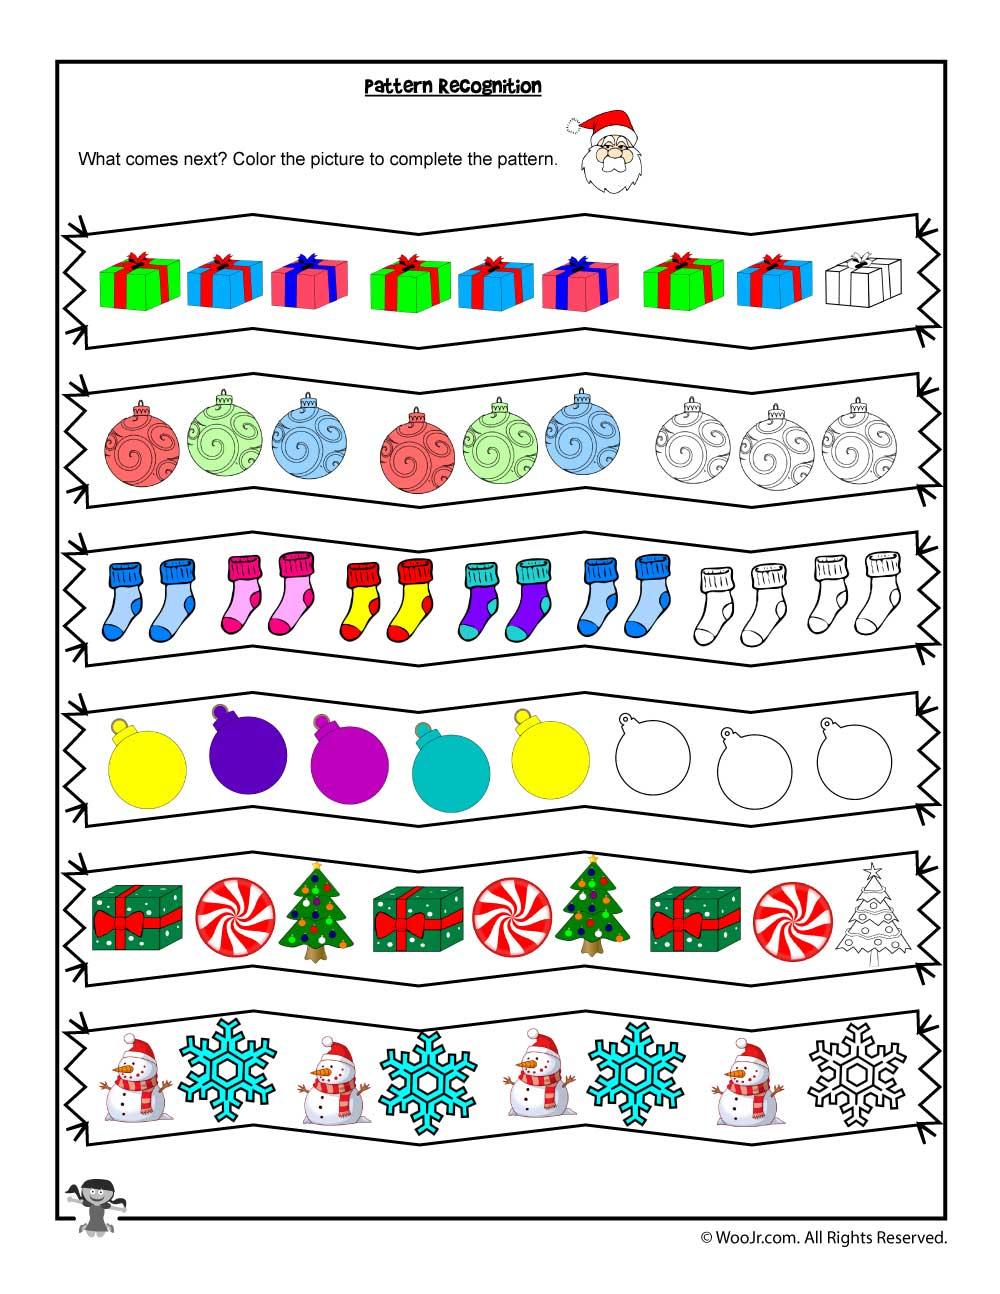 Pattern Recognition Christmas Coloring Worksheet | Woo! Jr